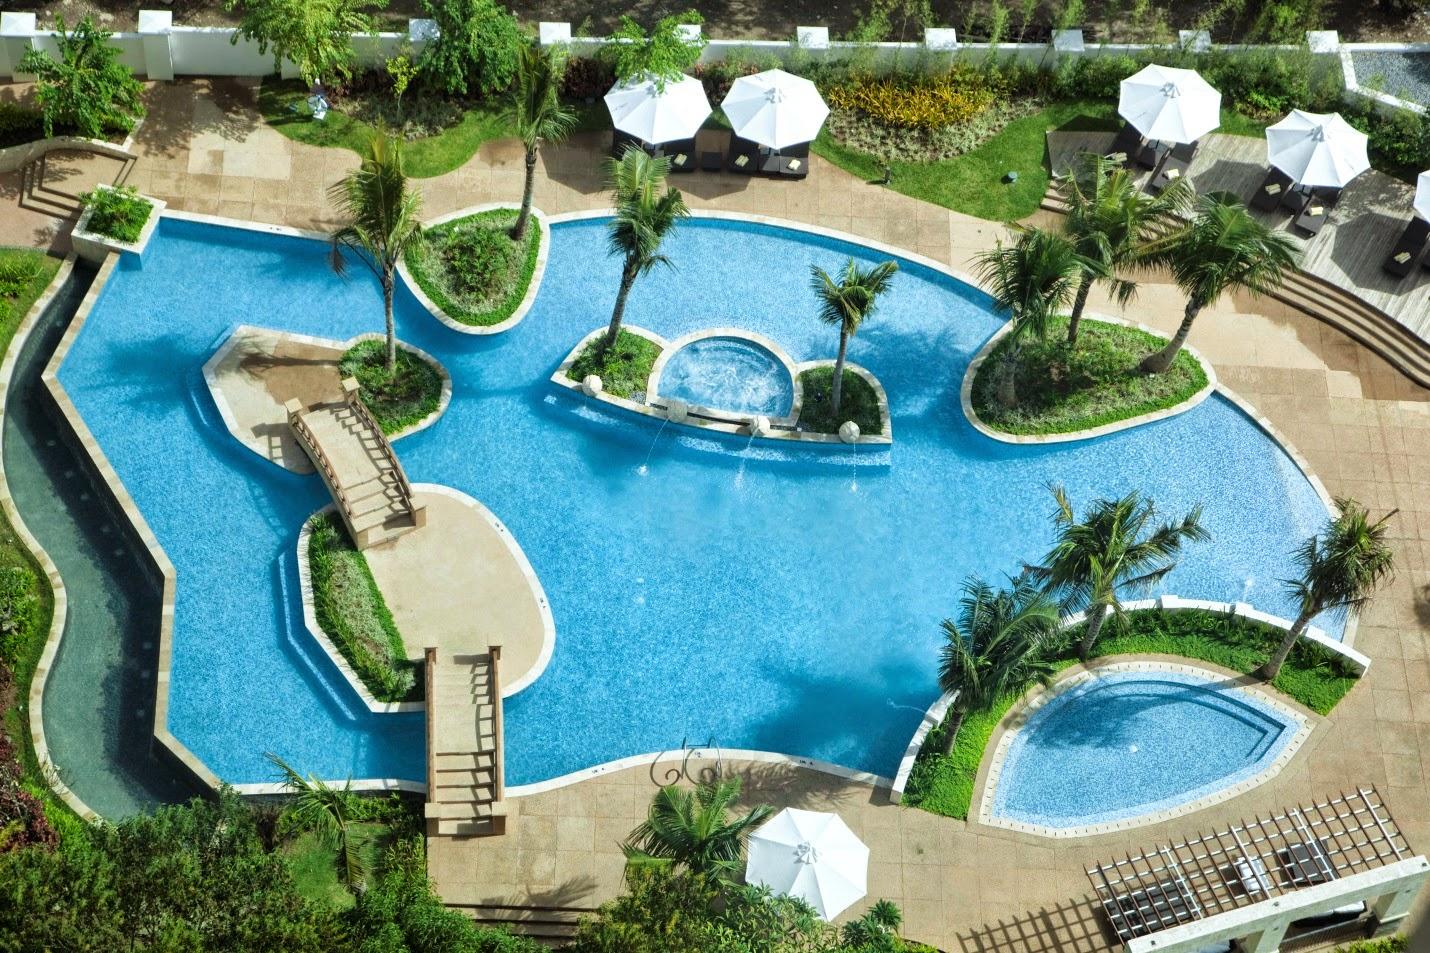 Cebu Urbano Radisson Blu Hotel The Answer To Your Five Star Deluxe Stay Experience In Cebu